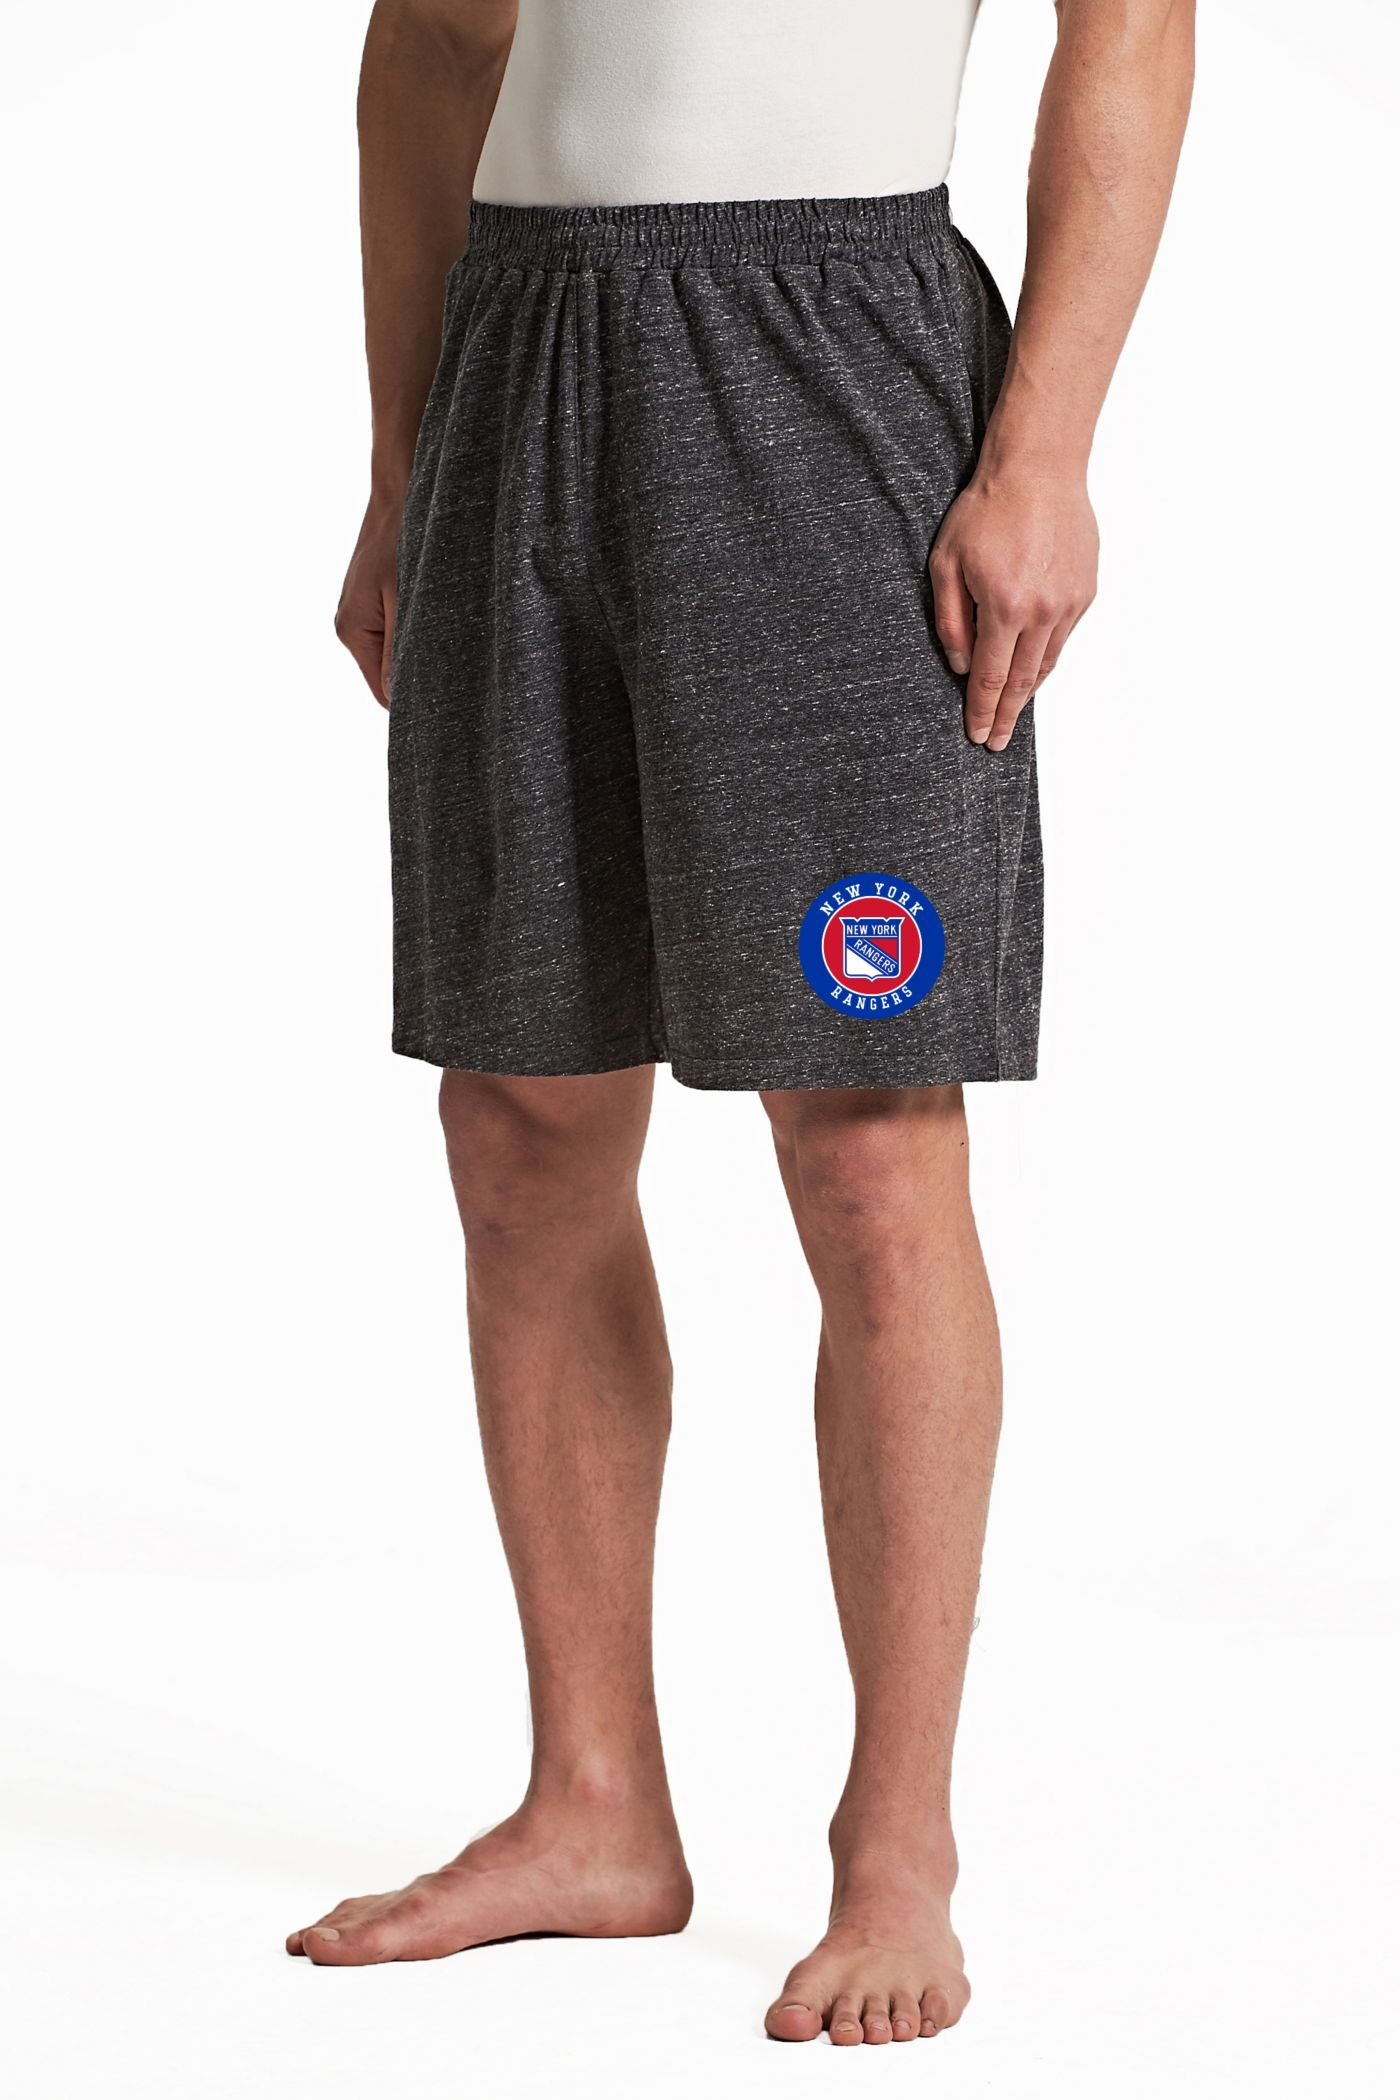 Concepts Sport Men's New York Rangers Pitch Grey Shorts